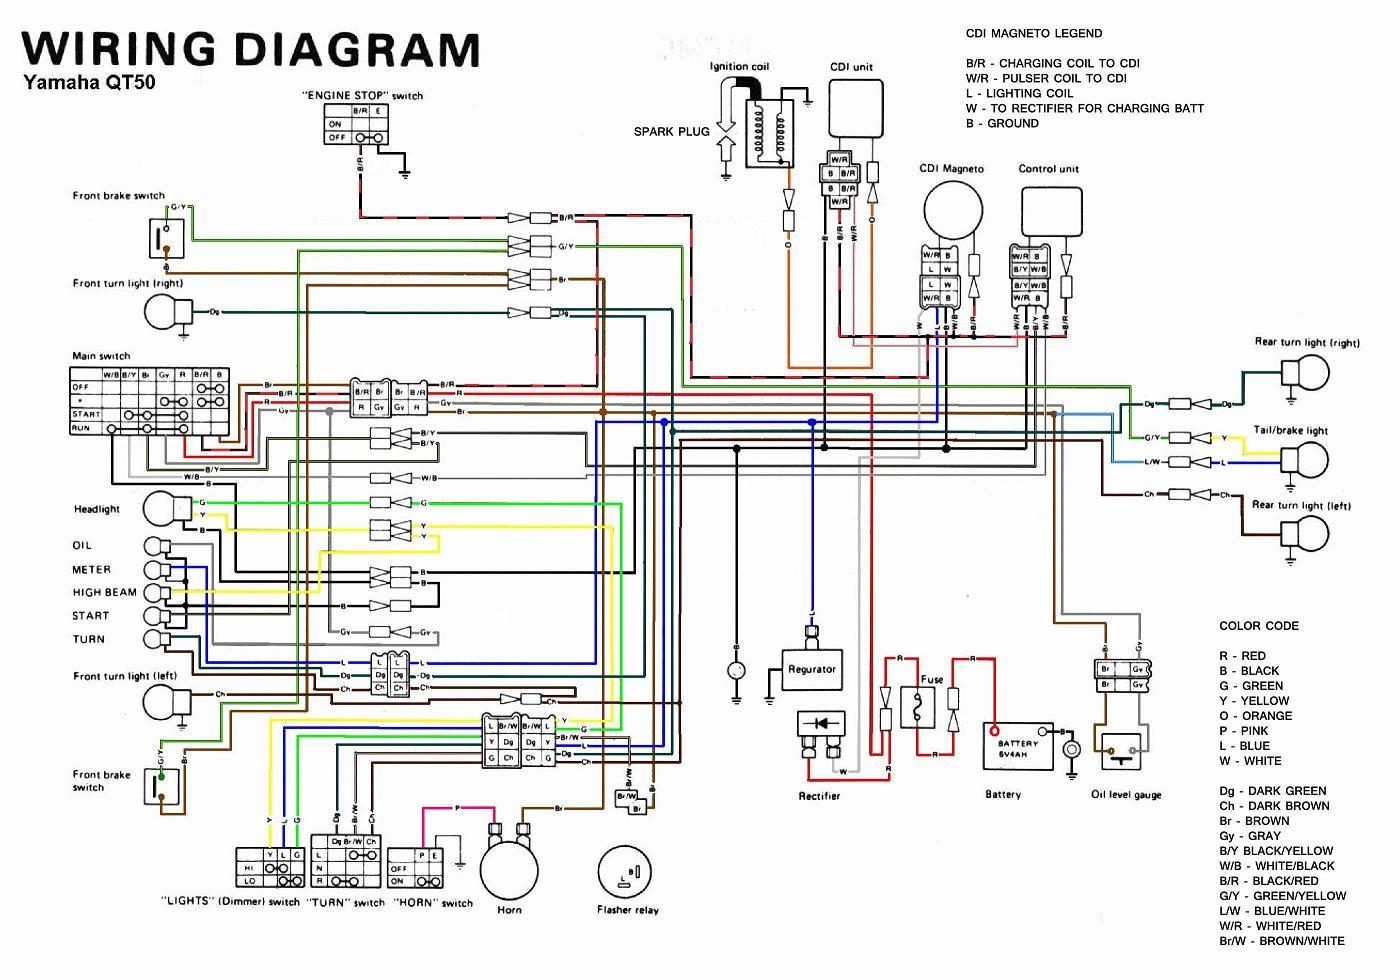 Yamaha Jog Rr Wiring Diagram | Wiring Schematic Diagram on